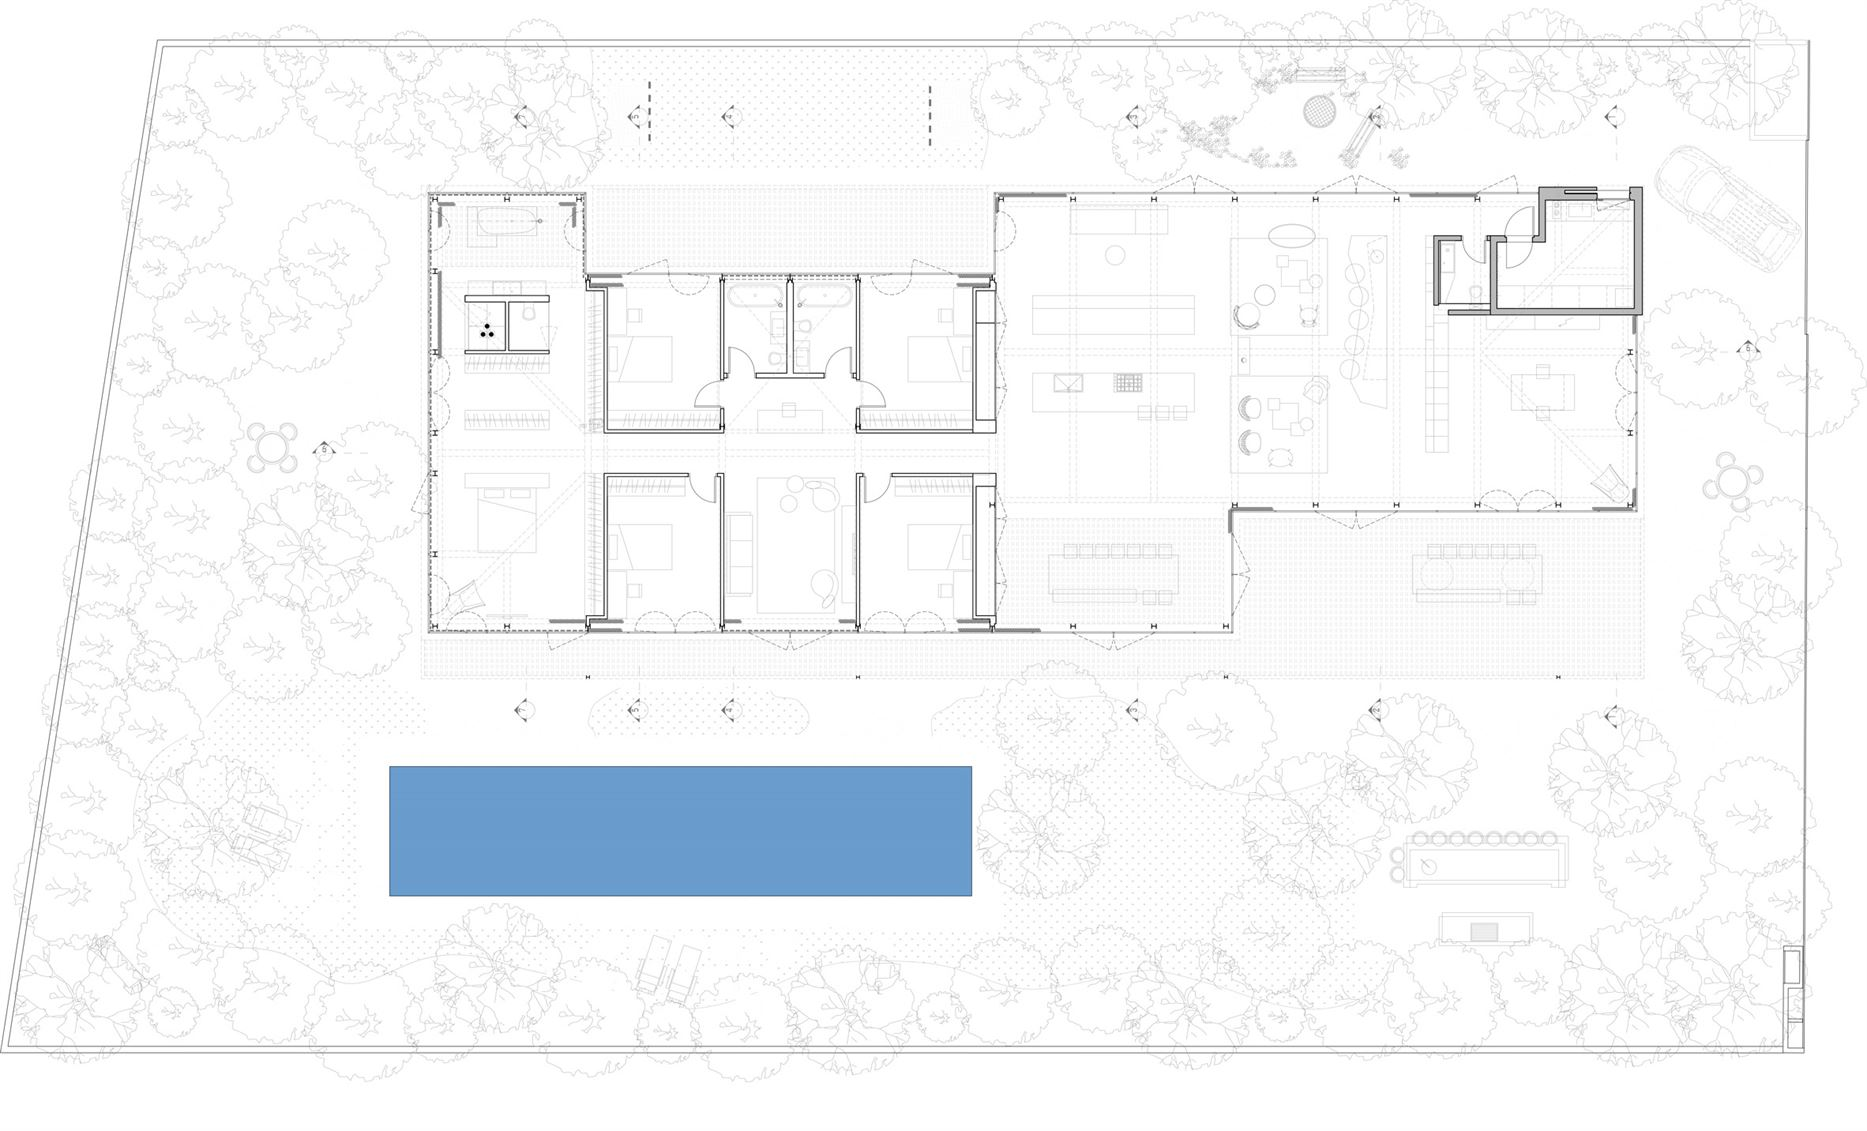 m-house-pitsou-kedem-architecture-residential-israel_dezeen_floor-plan